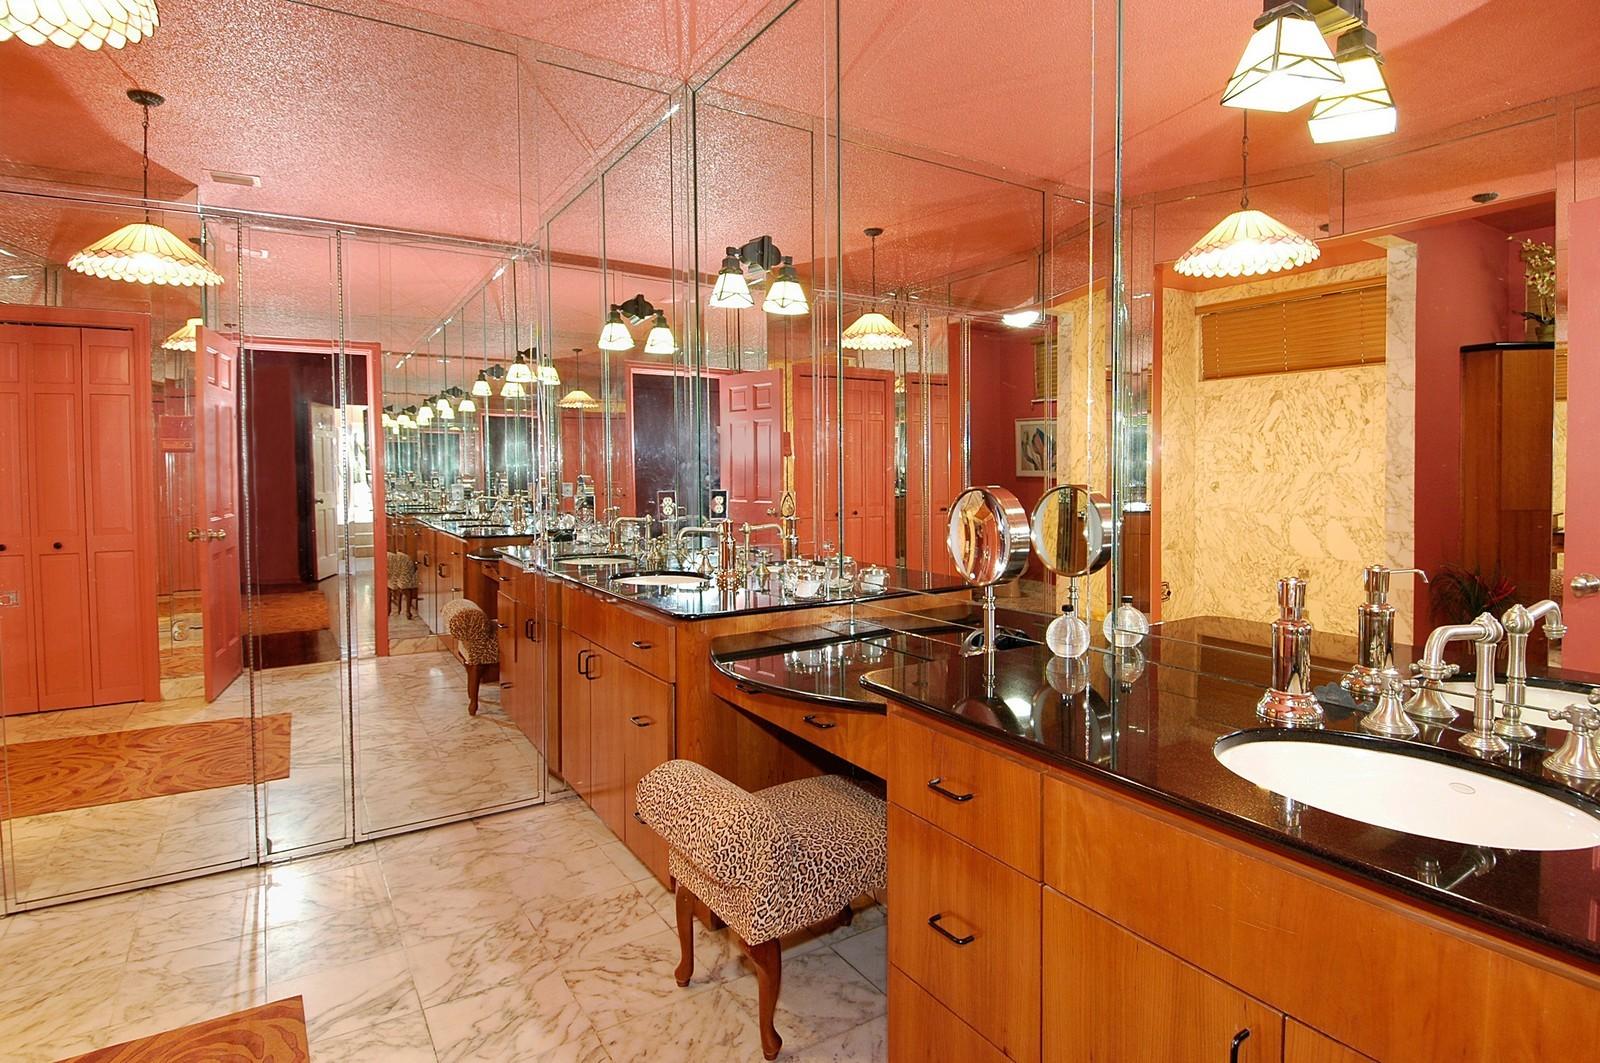 Real Estate Photography - 622 Golden Beach Dr, Golden Beach, FL, 33160 - Master Bathroom